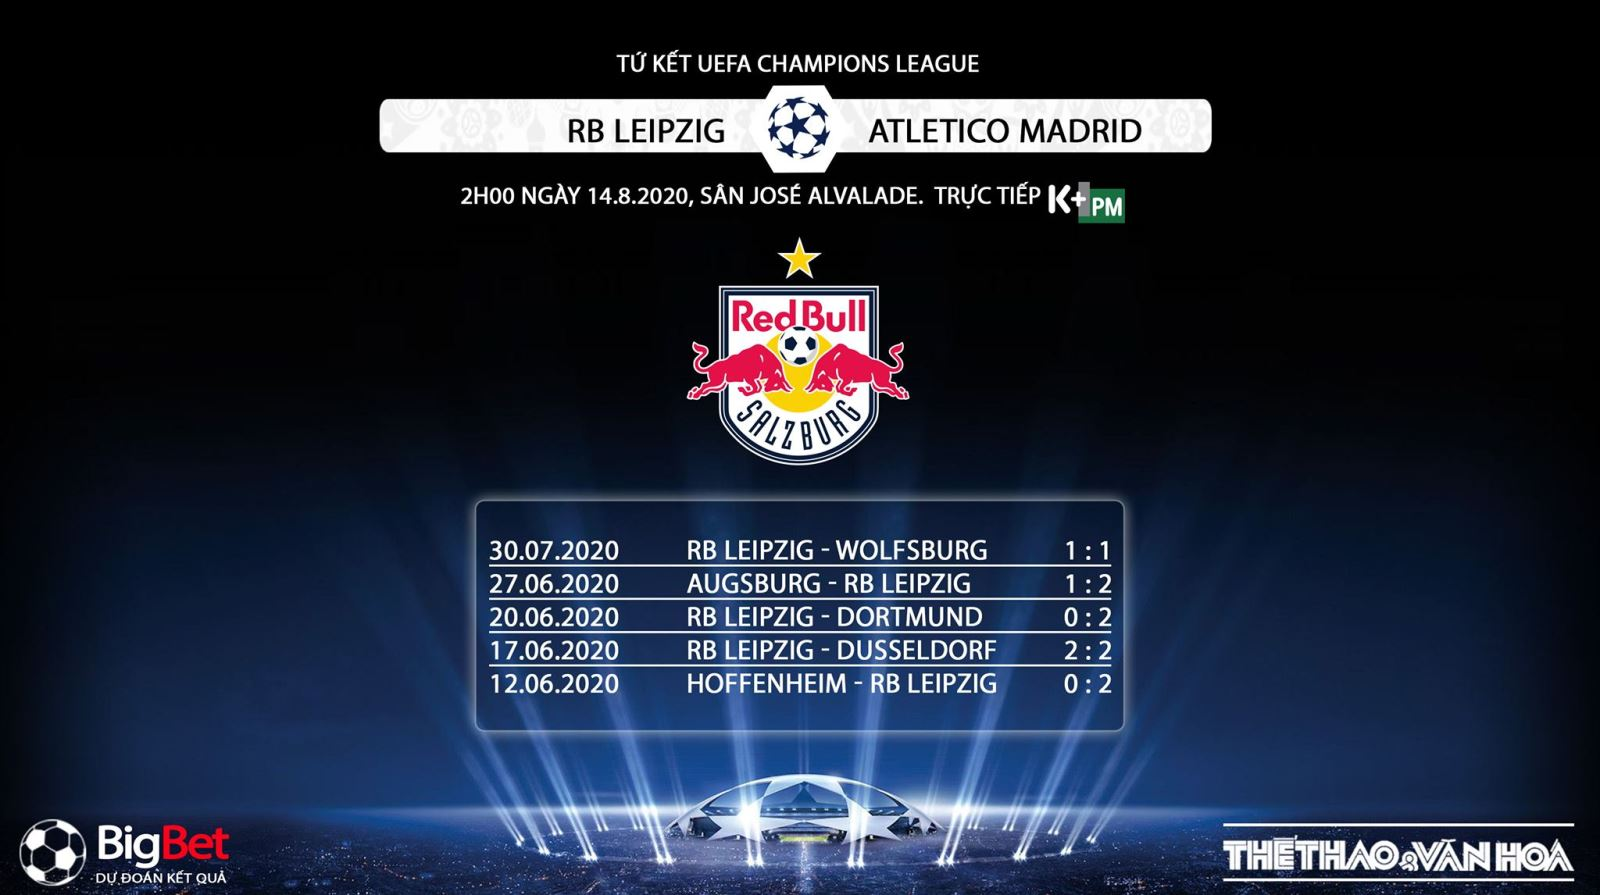 Leipzig vs Atletico Madrid, soi kèo Leipzig vs Atletico Madrid, trực tiếp bóng đá, Leipzig, Atletico Madrid, bóng đá, soi kèo, kèo bóng đá